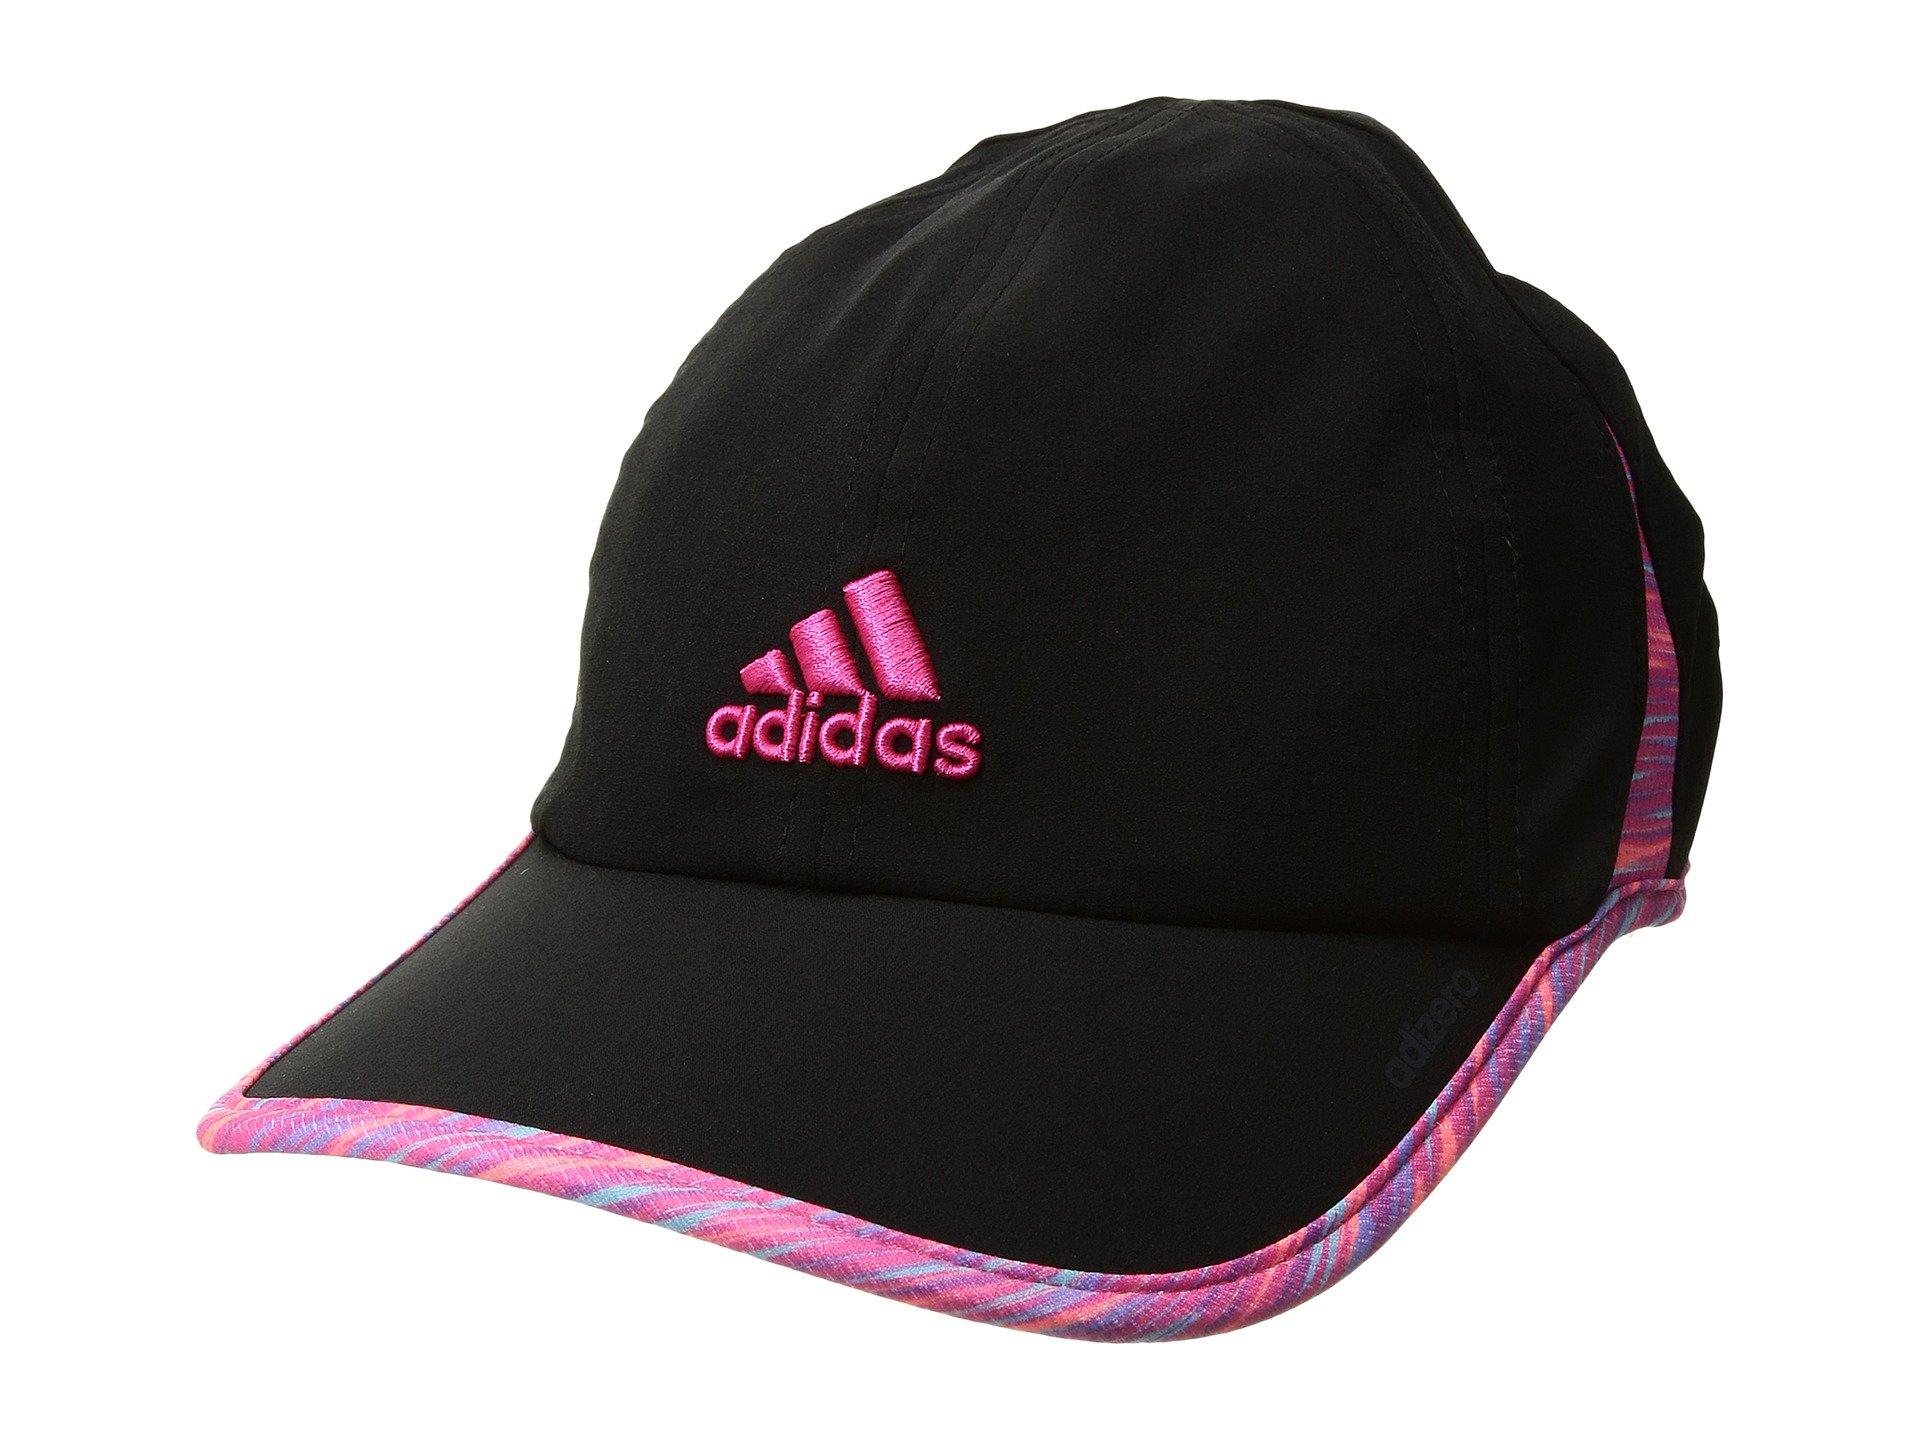 804563697da Adidas Originals Adizero Ii Cap In Black Twister Shock Pink Print Shock Pink